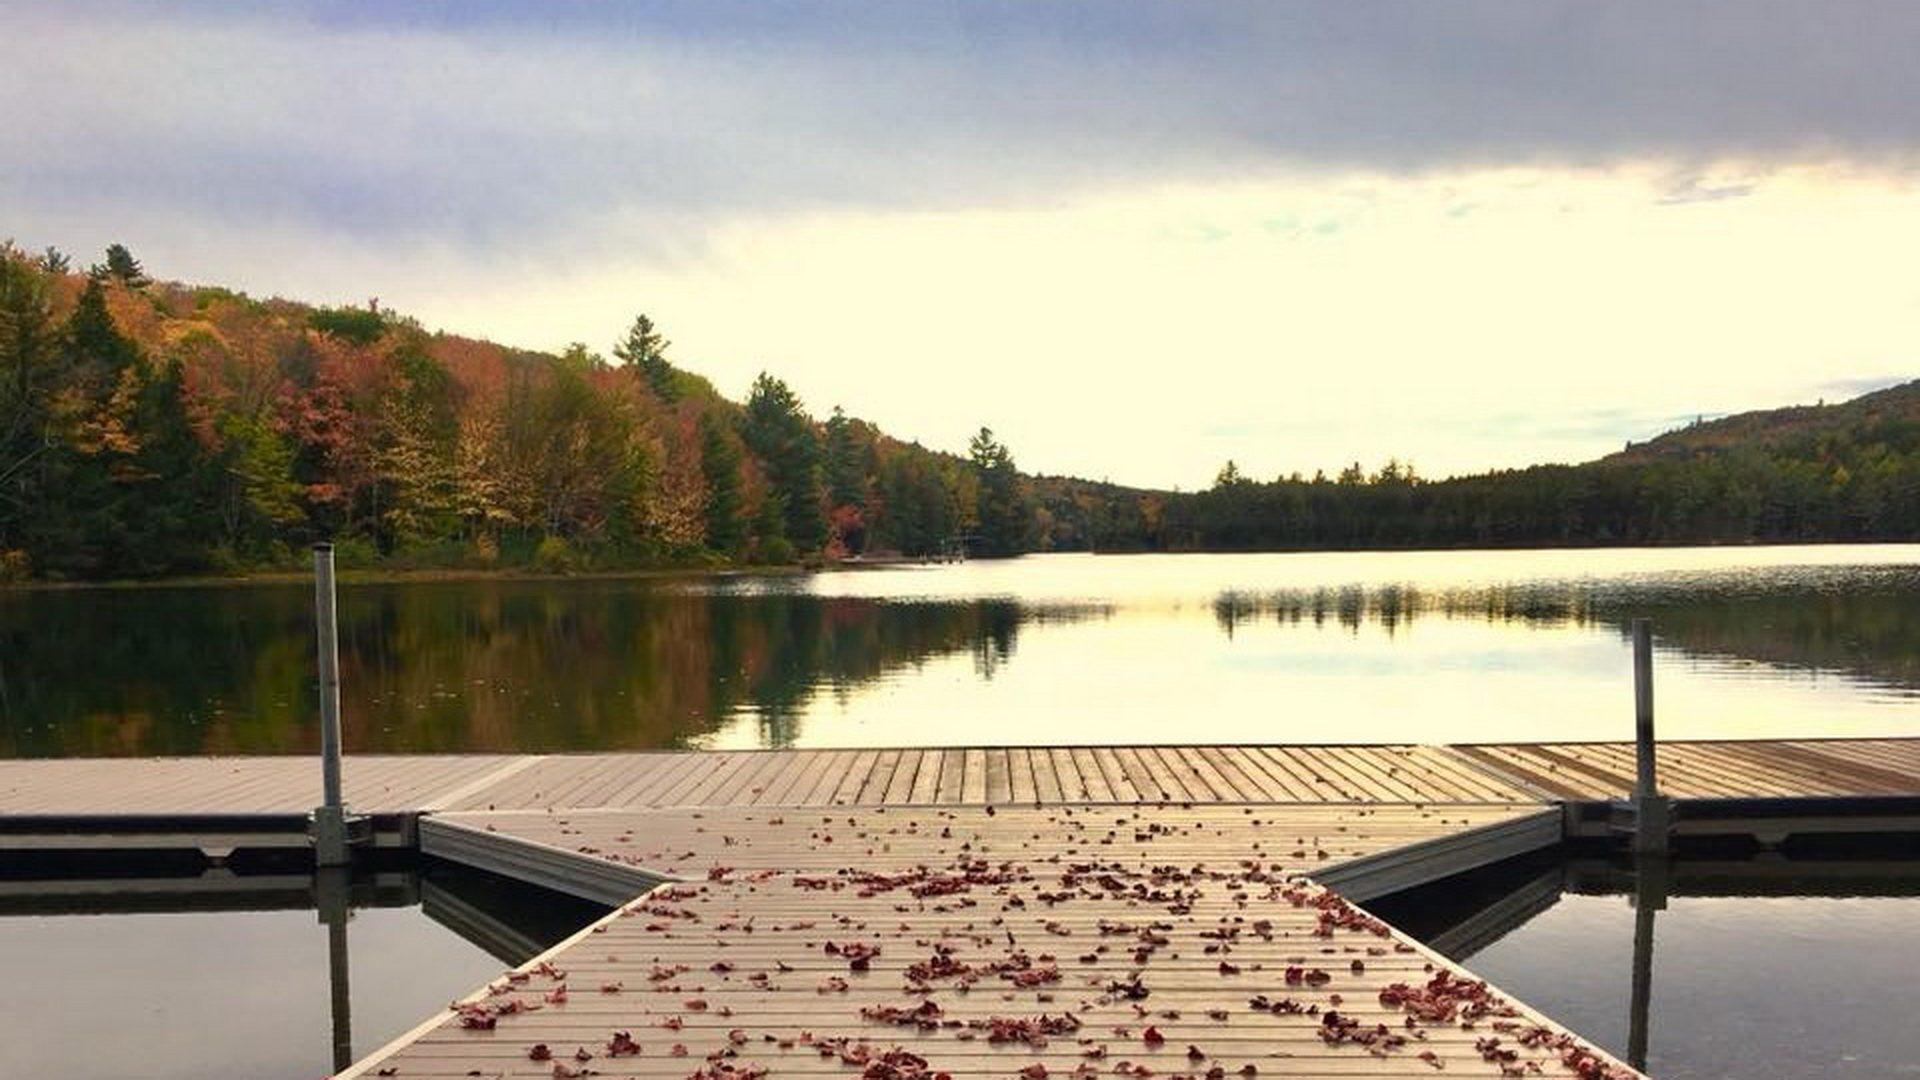 Boathouse dock in Fall